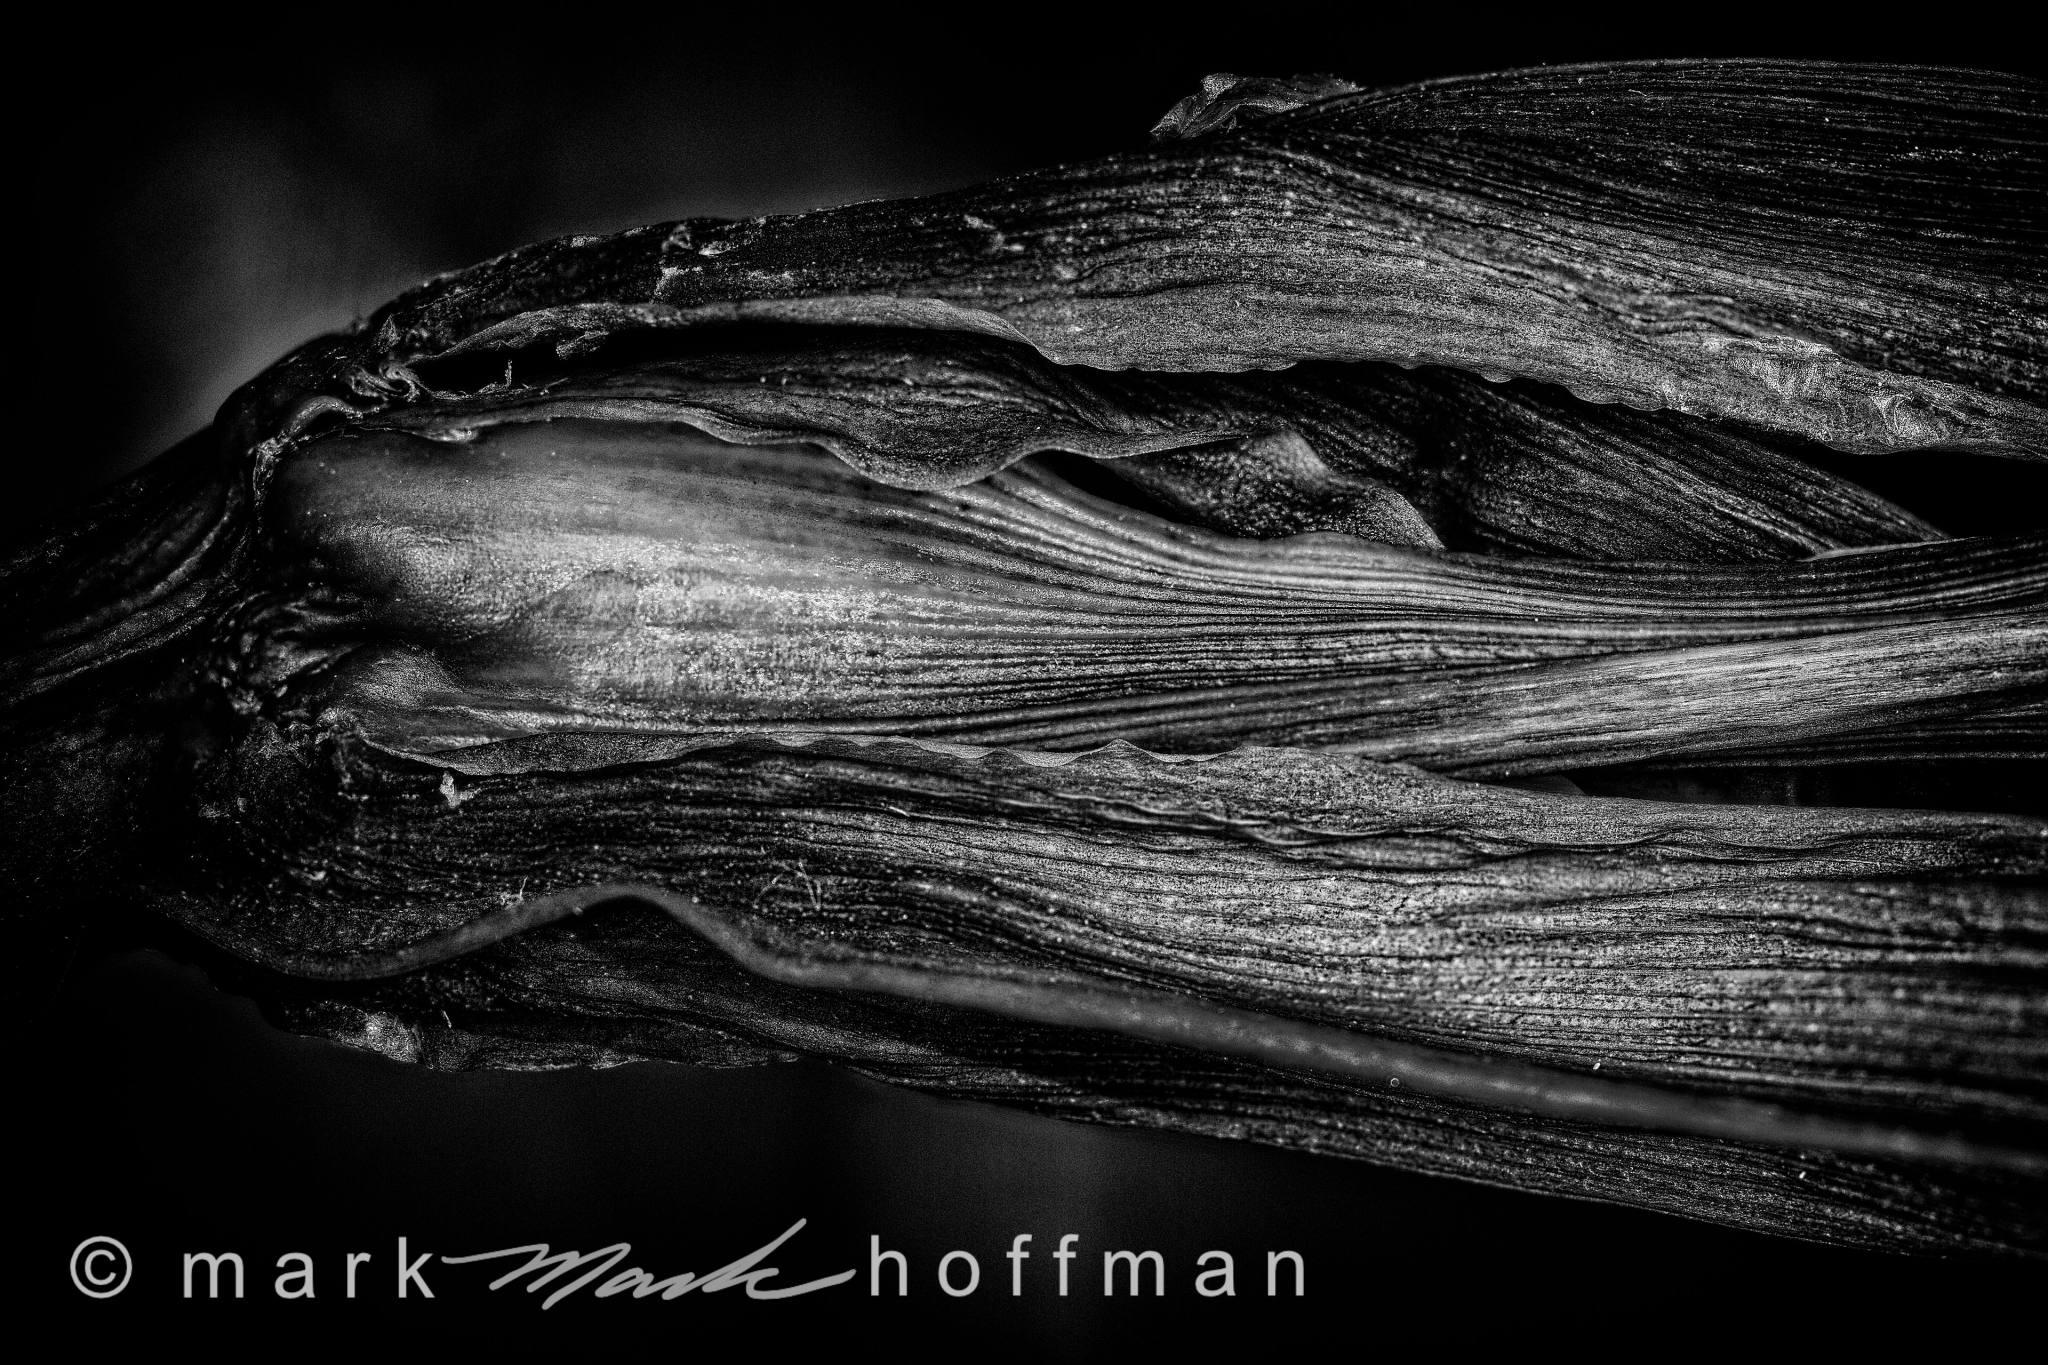 Mark_Hoffman_photophart_20150217_0281to0284_ZSretPM_PFX_Silv_DB_cap1_var1.jpg